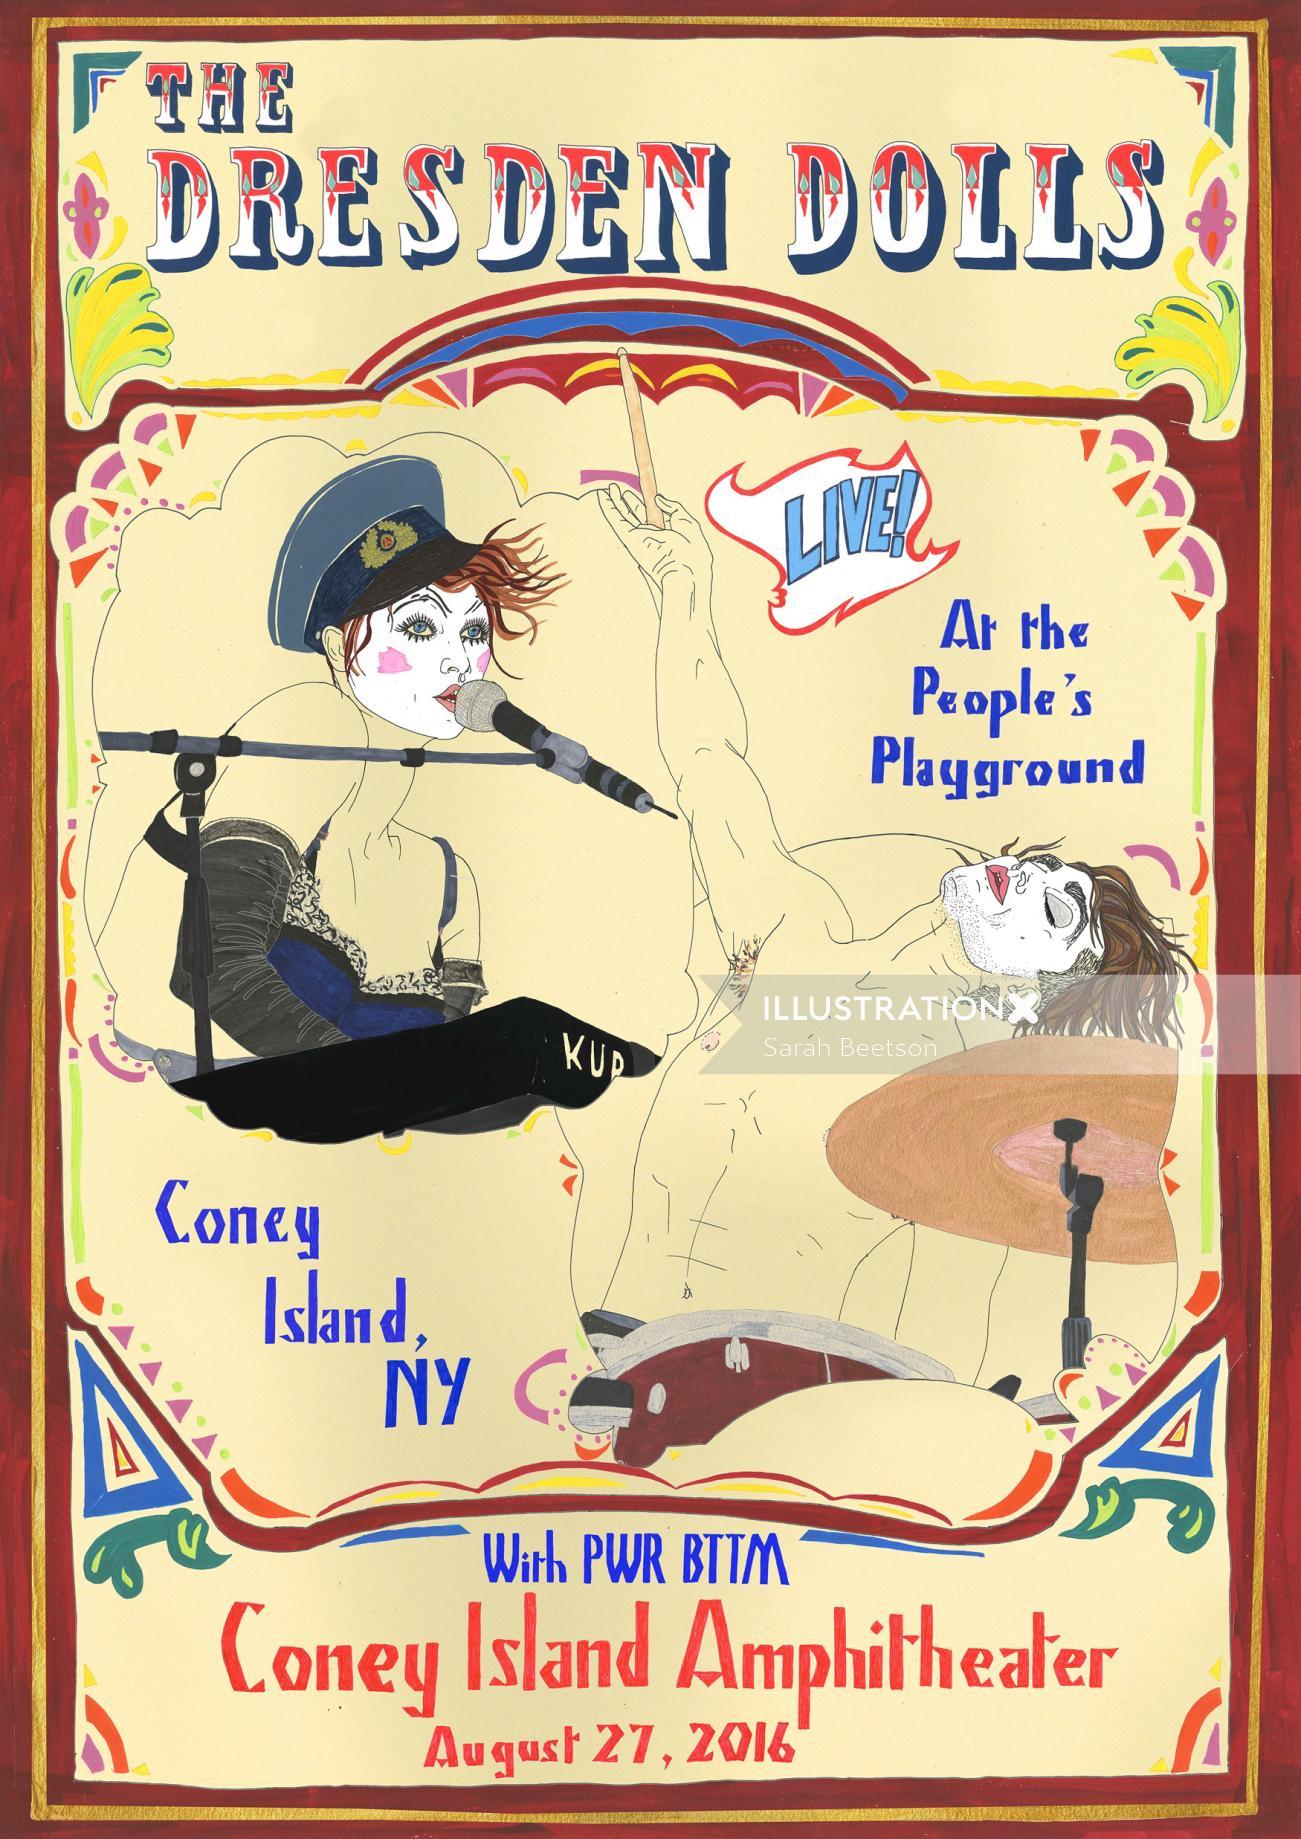 An illustration of the Dresden Dolls